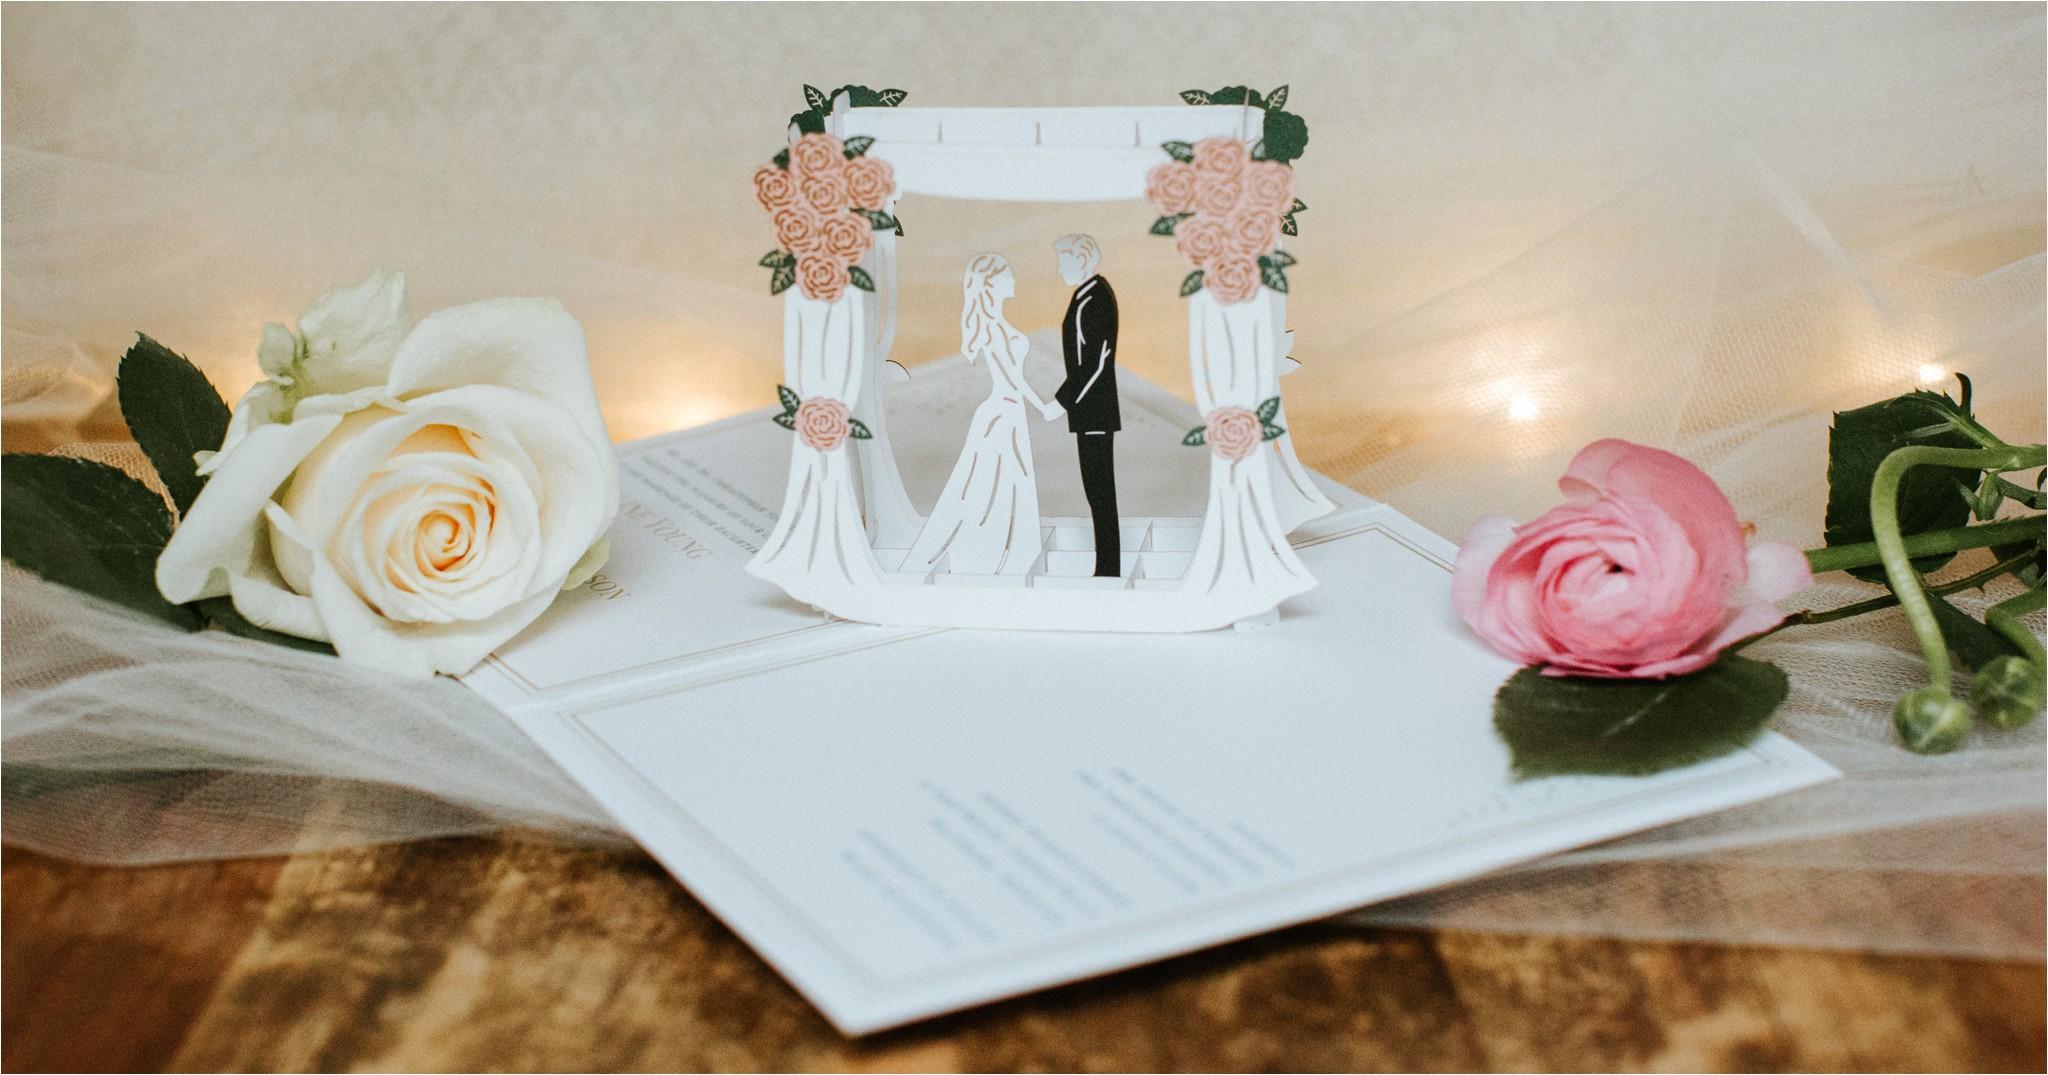 introducing lovepop wedding invitations